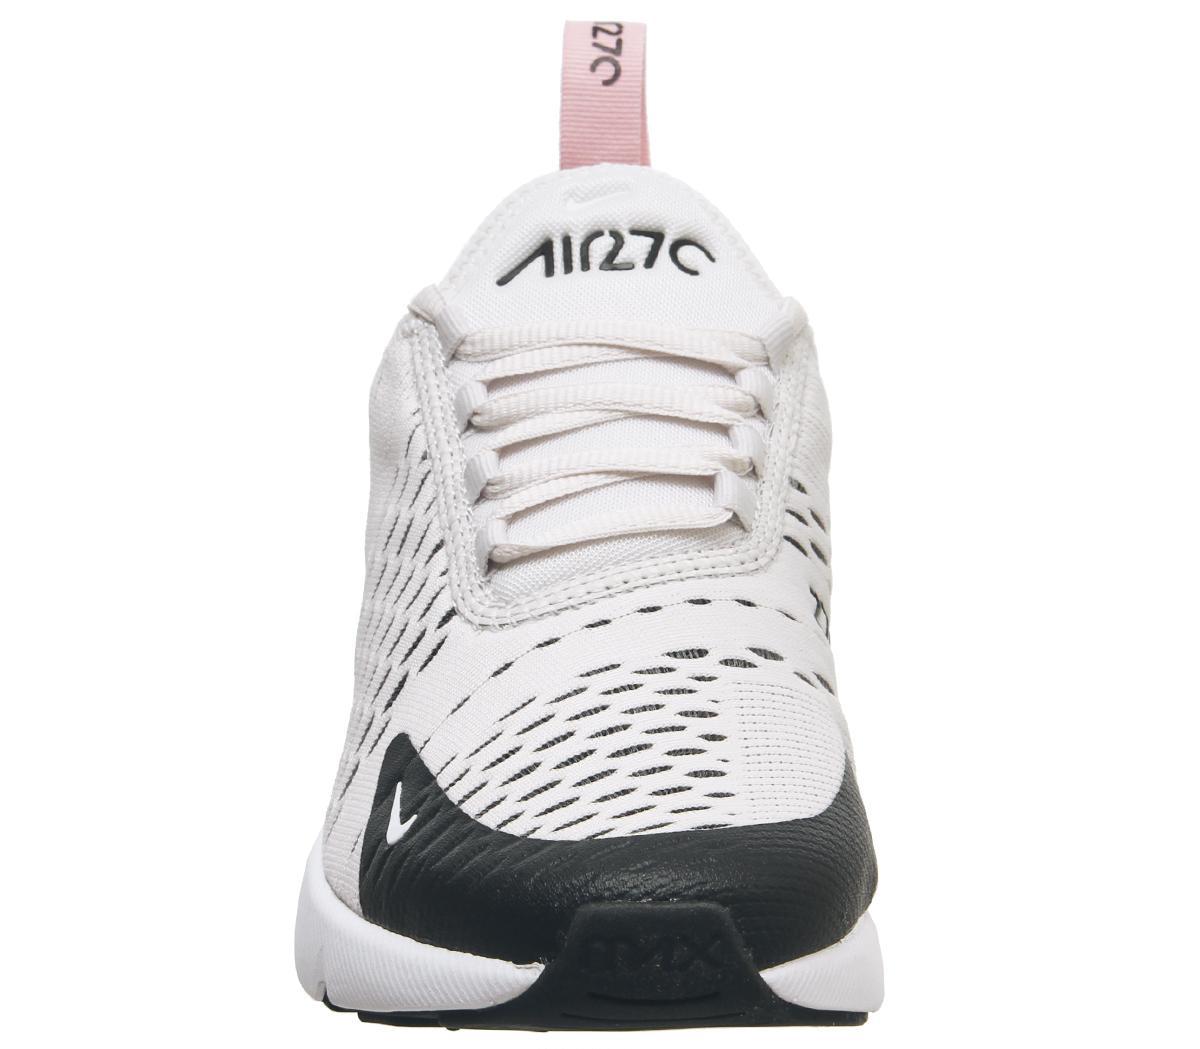 Nike Air Force 1 Low Damen Billig neugierig